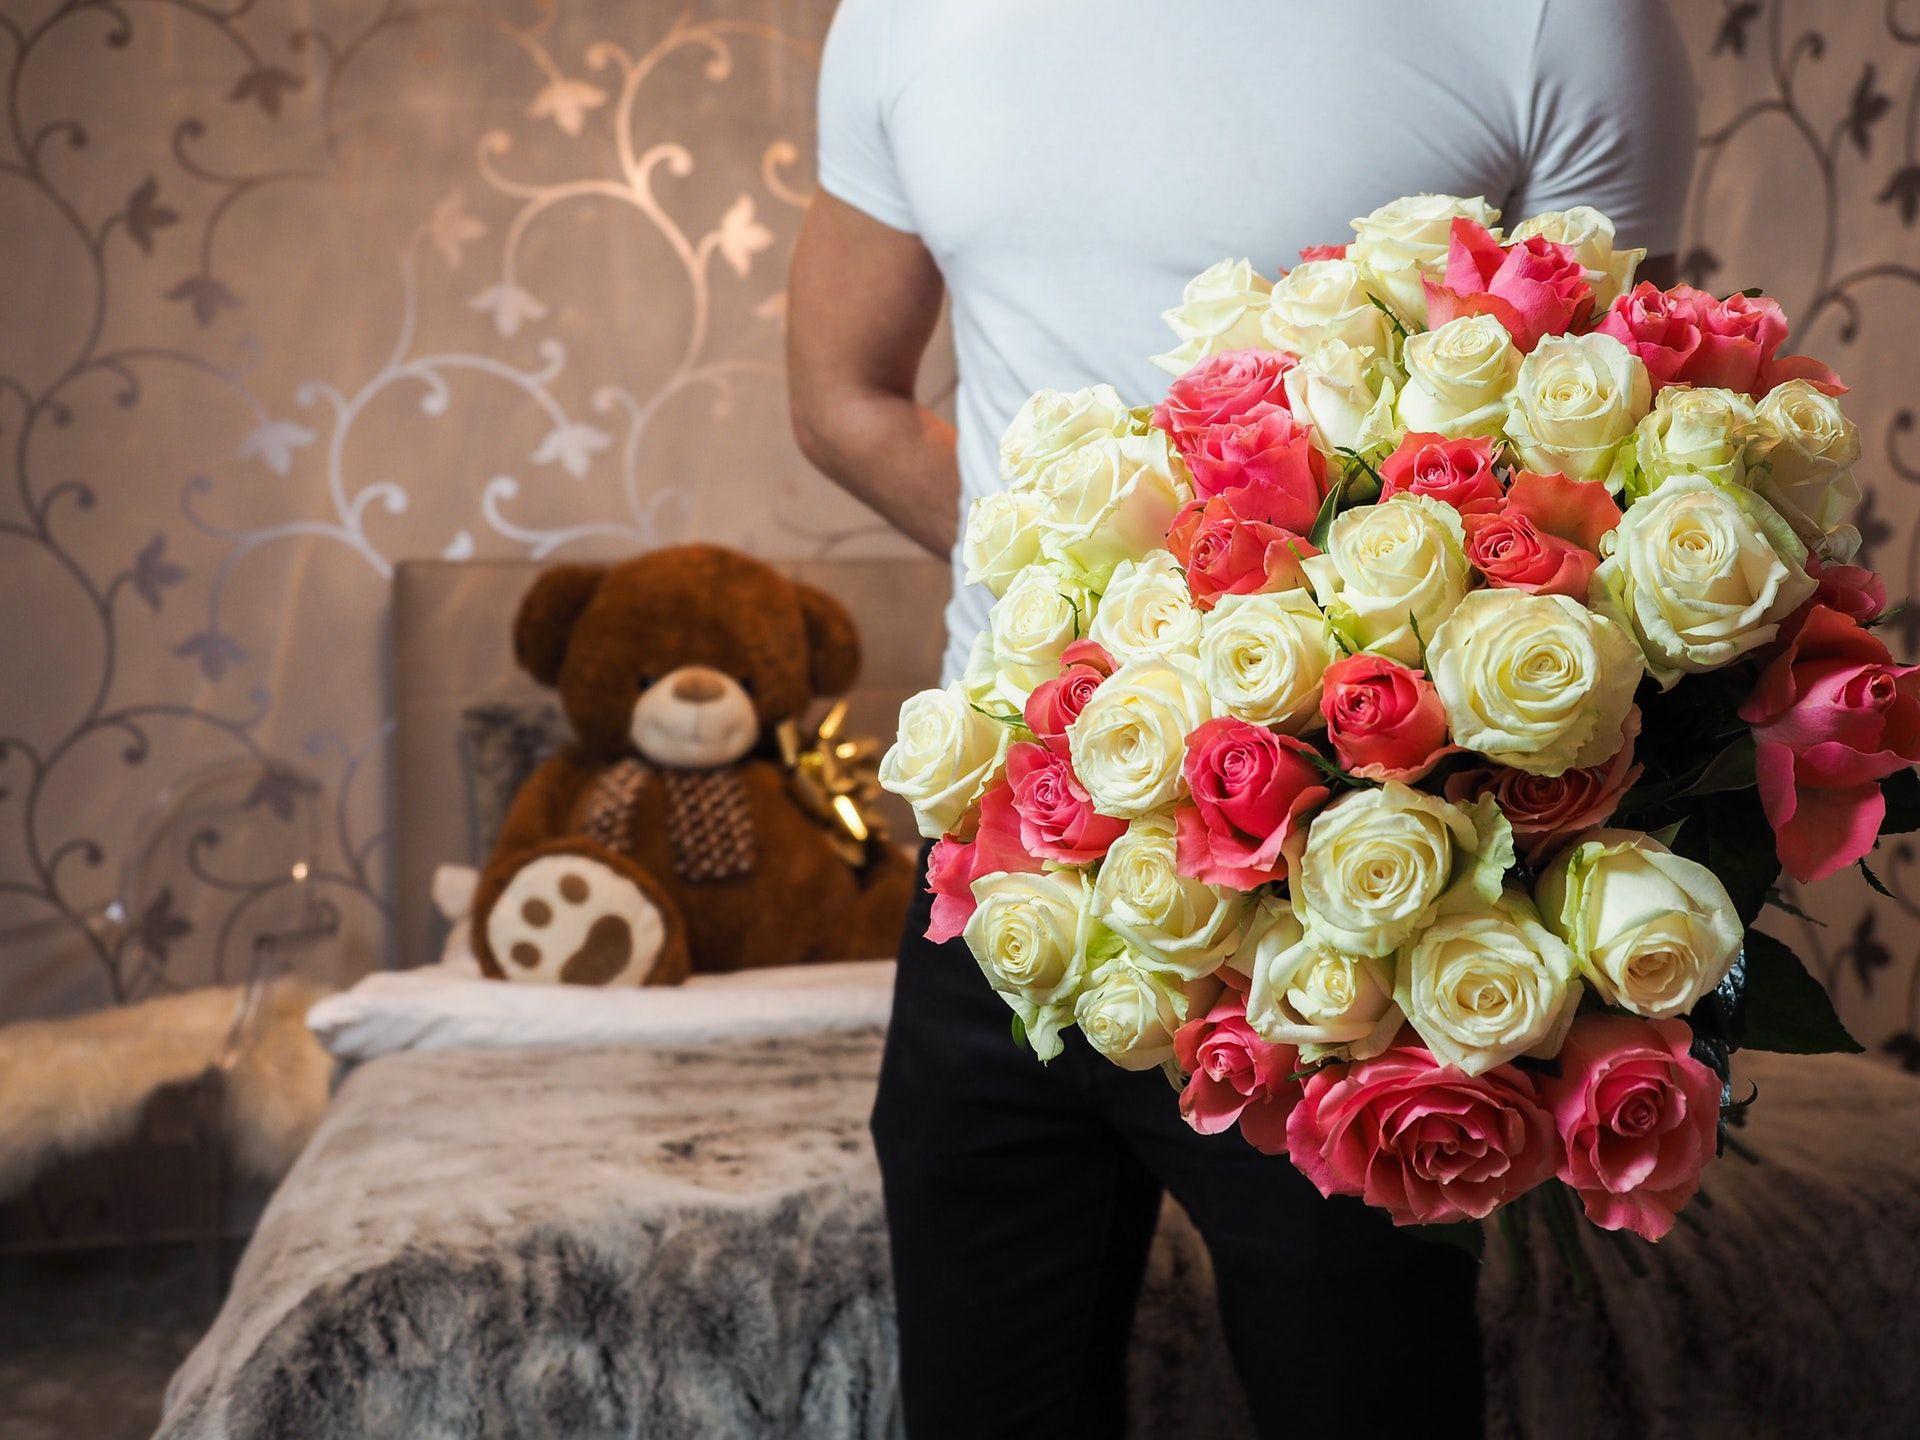 اجمل صور بوكيه ورد لاعياد الميلاد وللأحبه موقع مصري Flowers For Men Fresh Flower Bouquets Bunch Of Red Roses